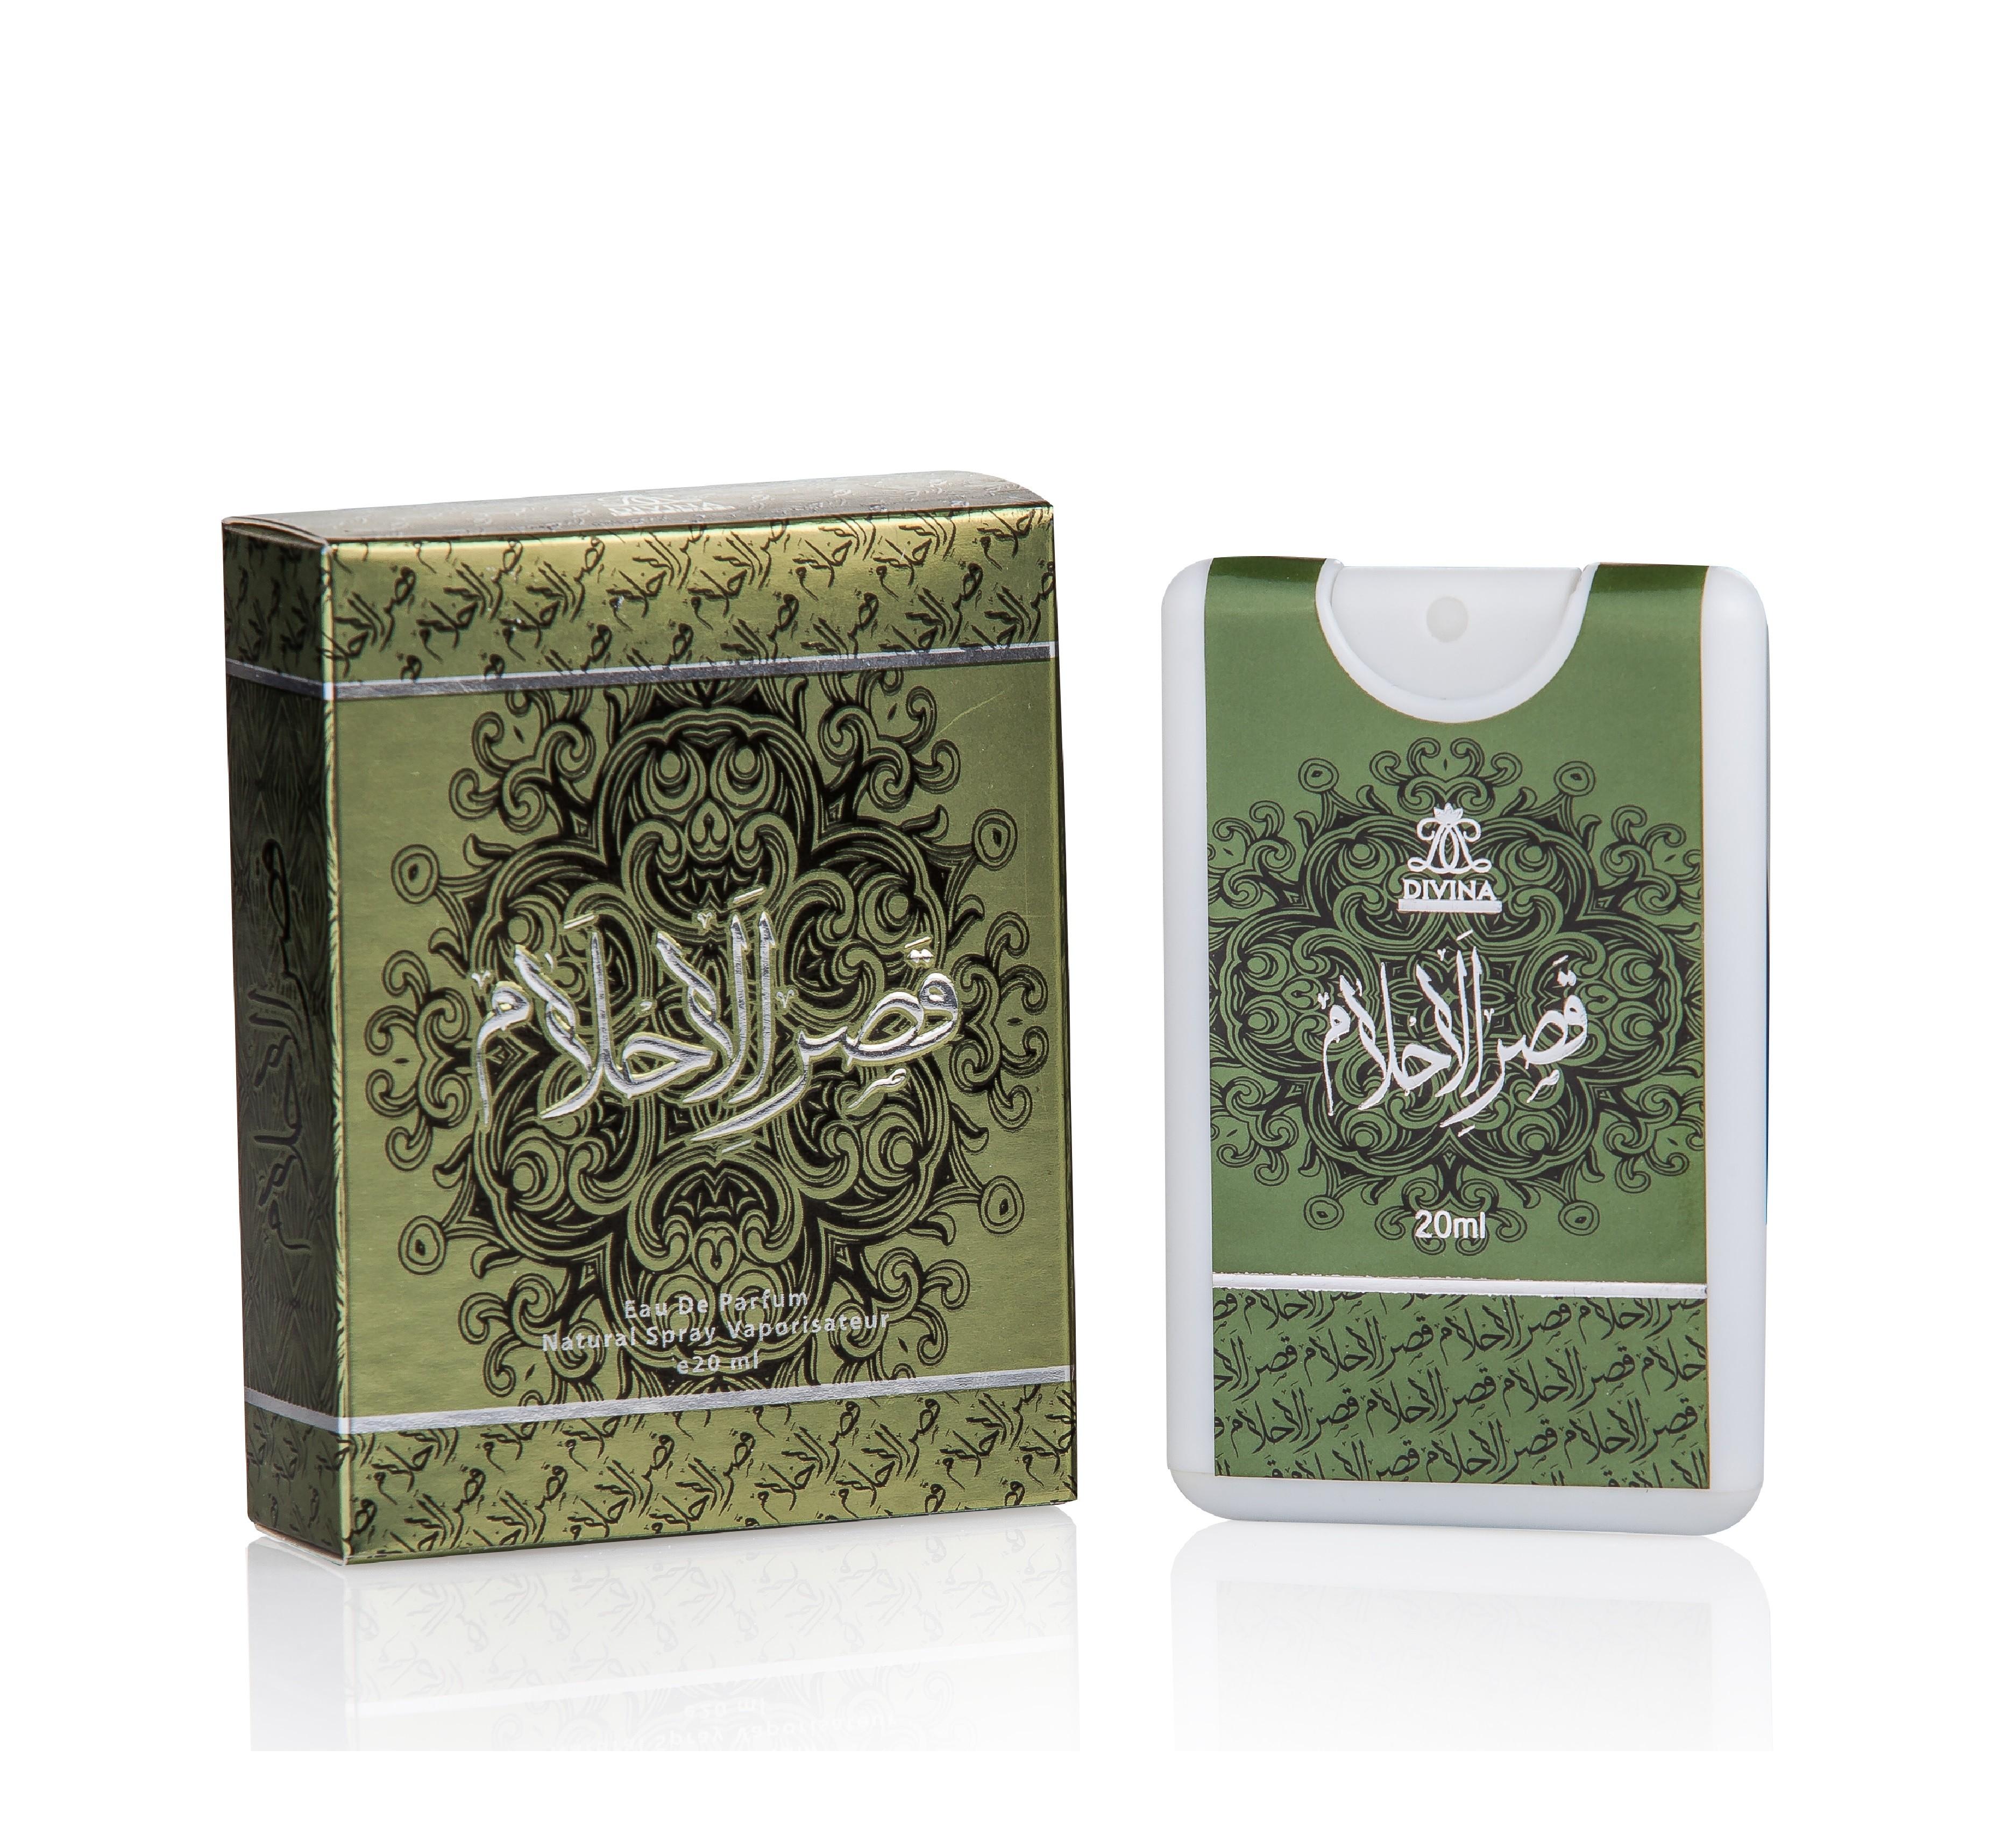 Qaser Al Ahlam 20 ml